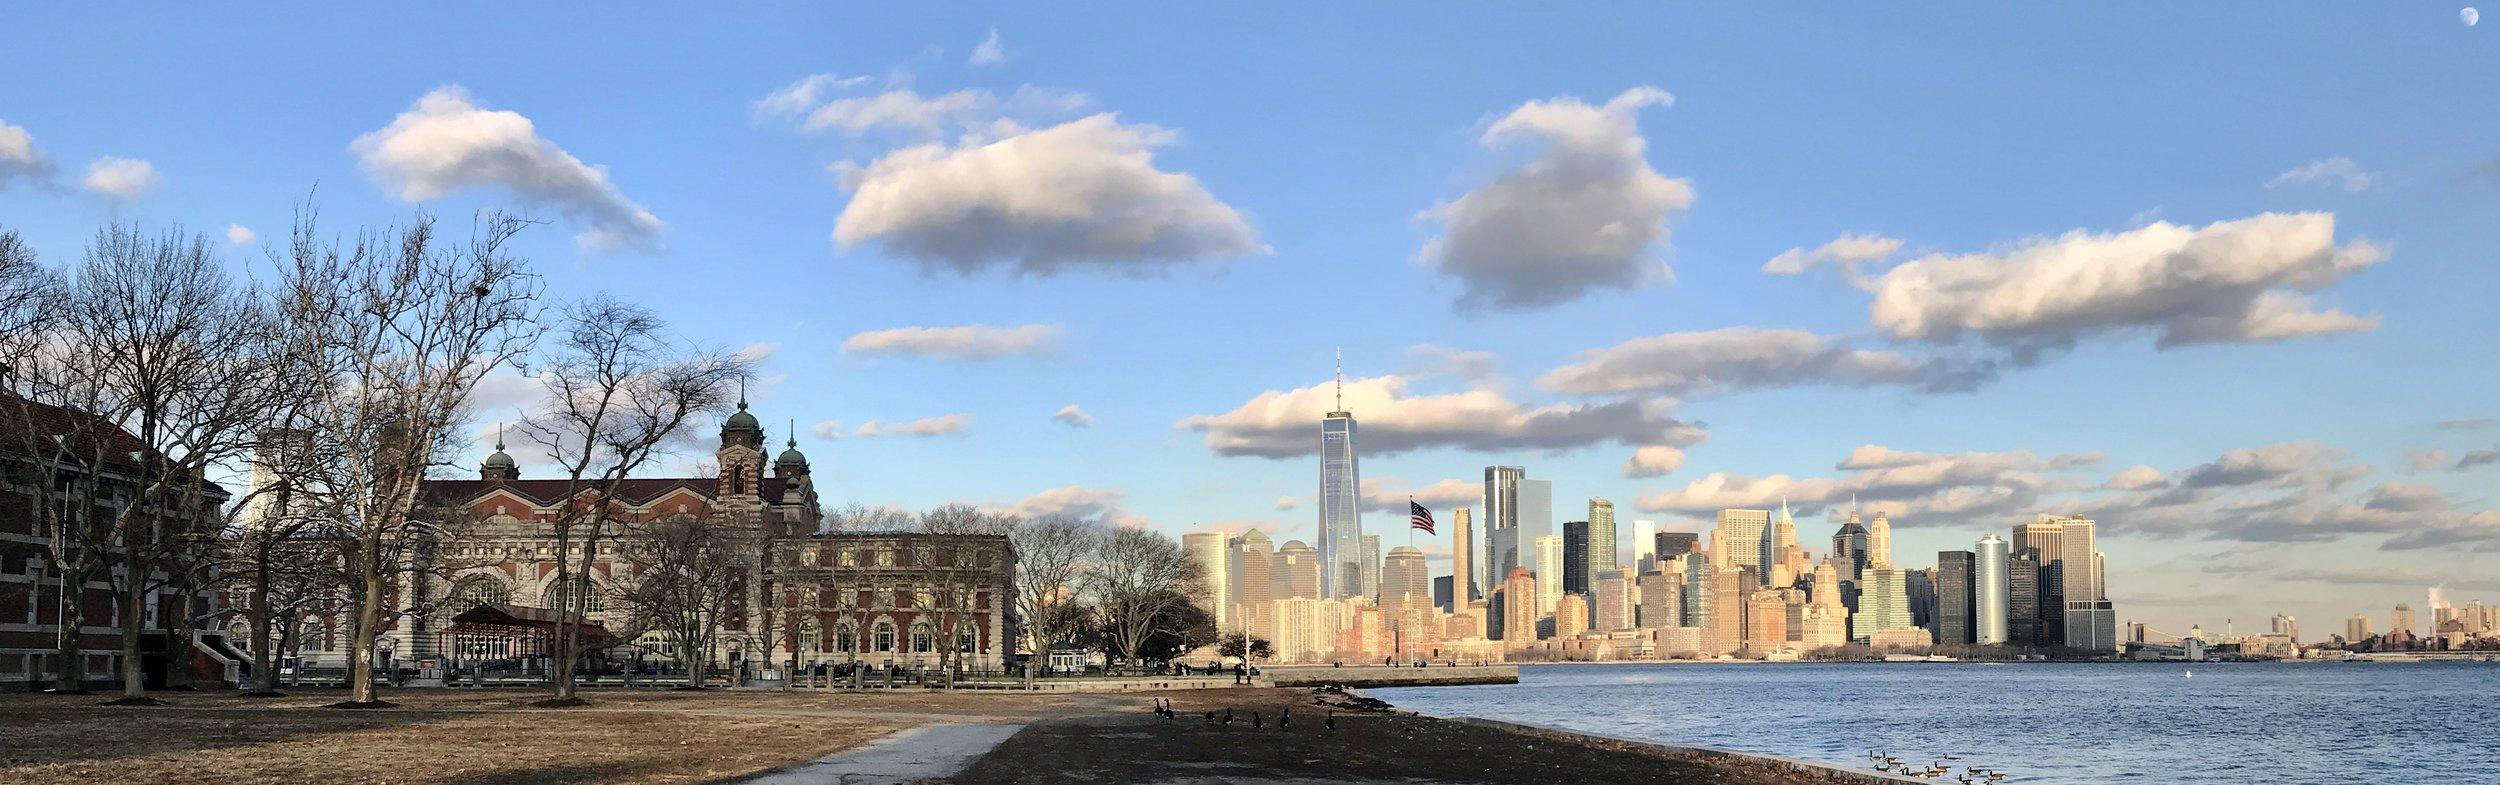 Ellis Island & Manhattan, NYC Skyline